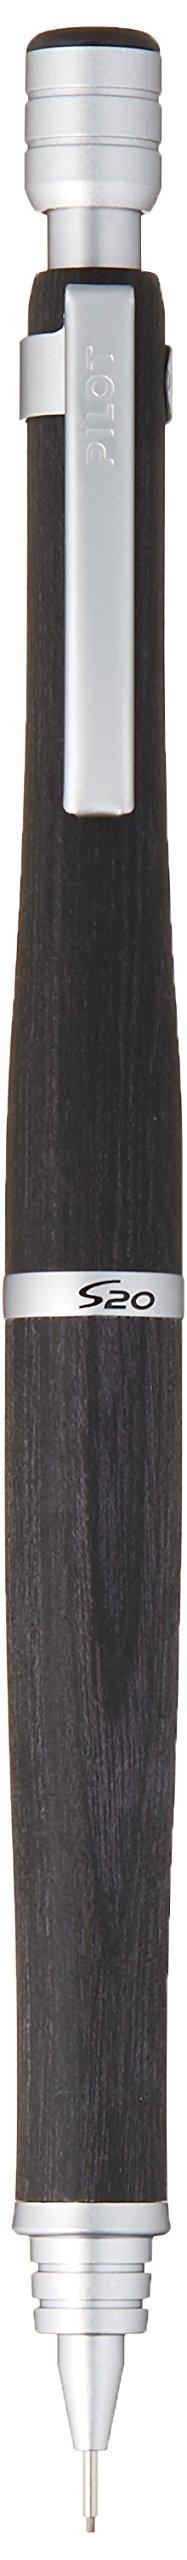 Pilot Portaminas, S20, 0,5 mm, Negro (HPS-2SK-B5)